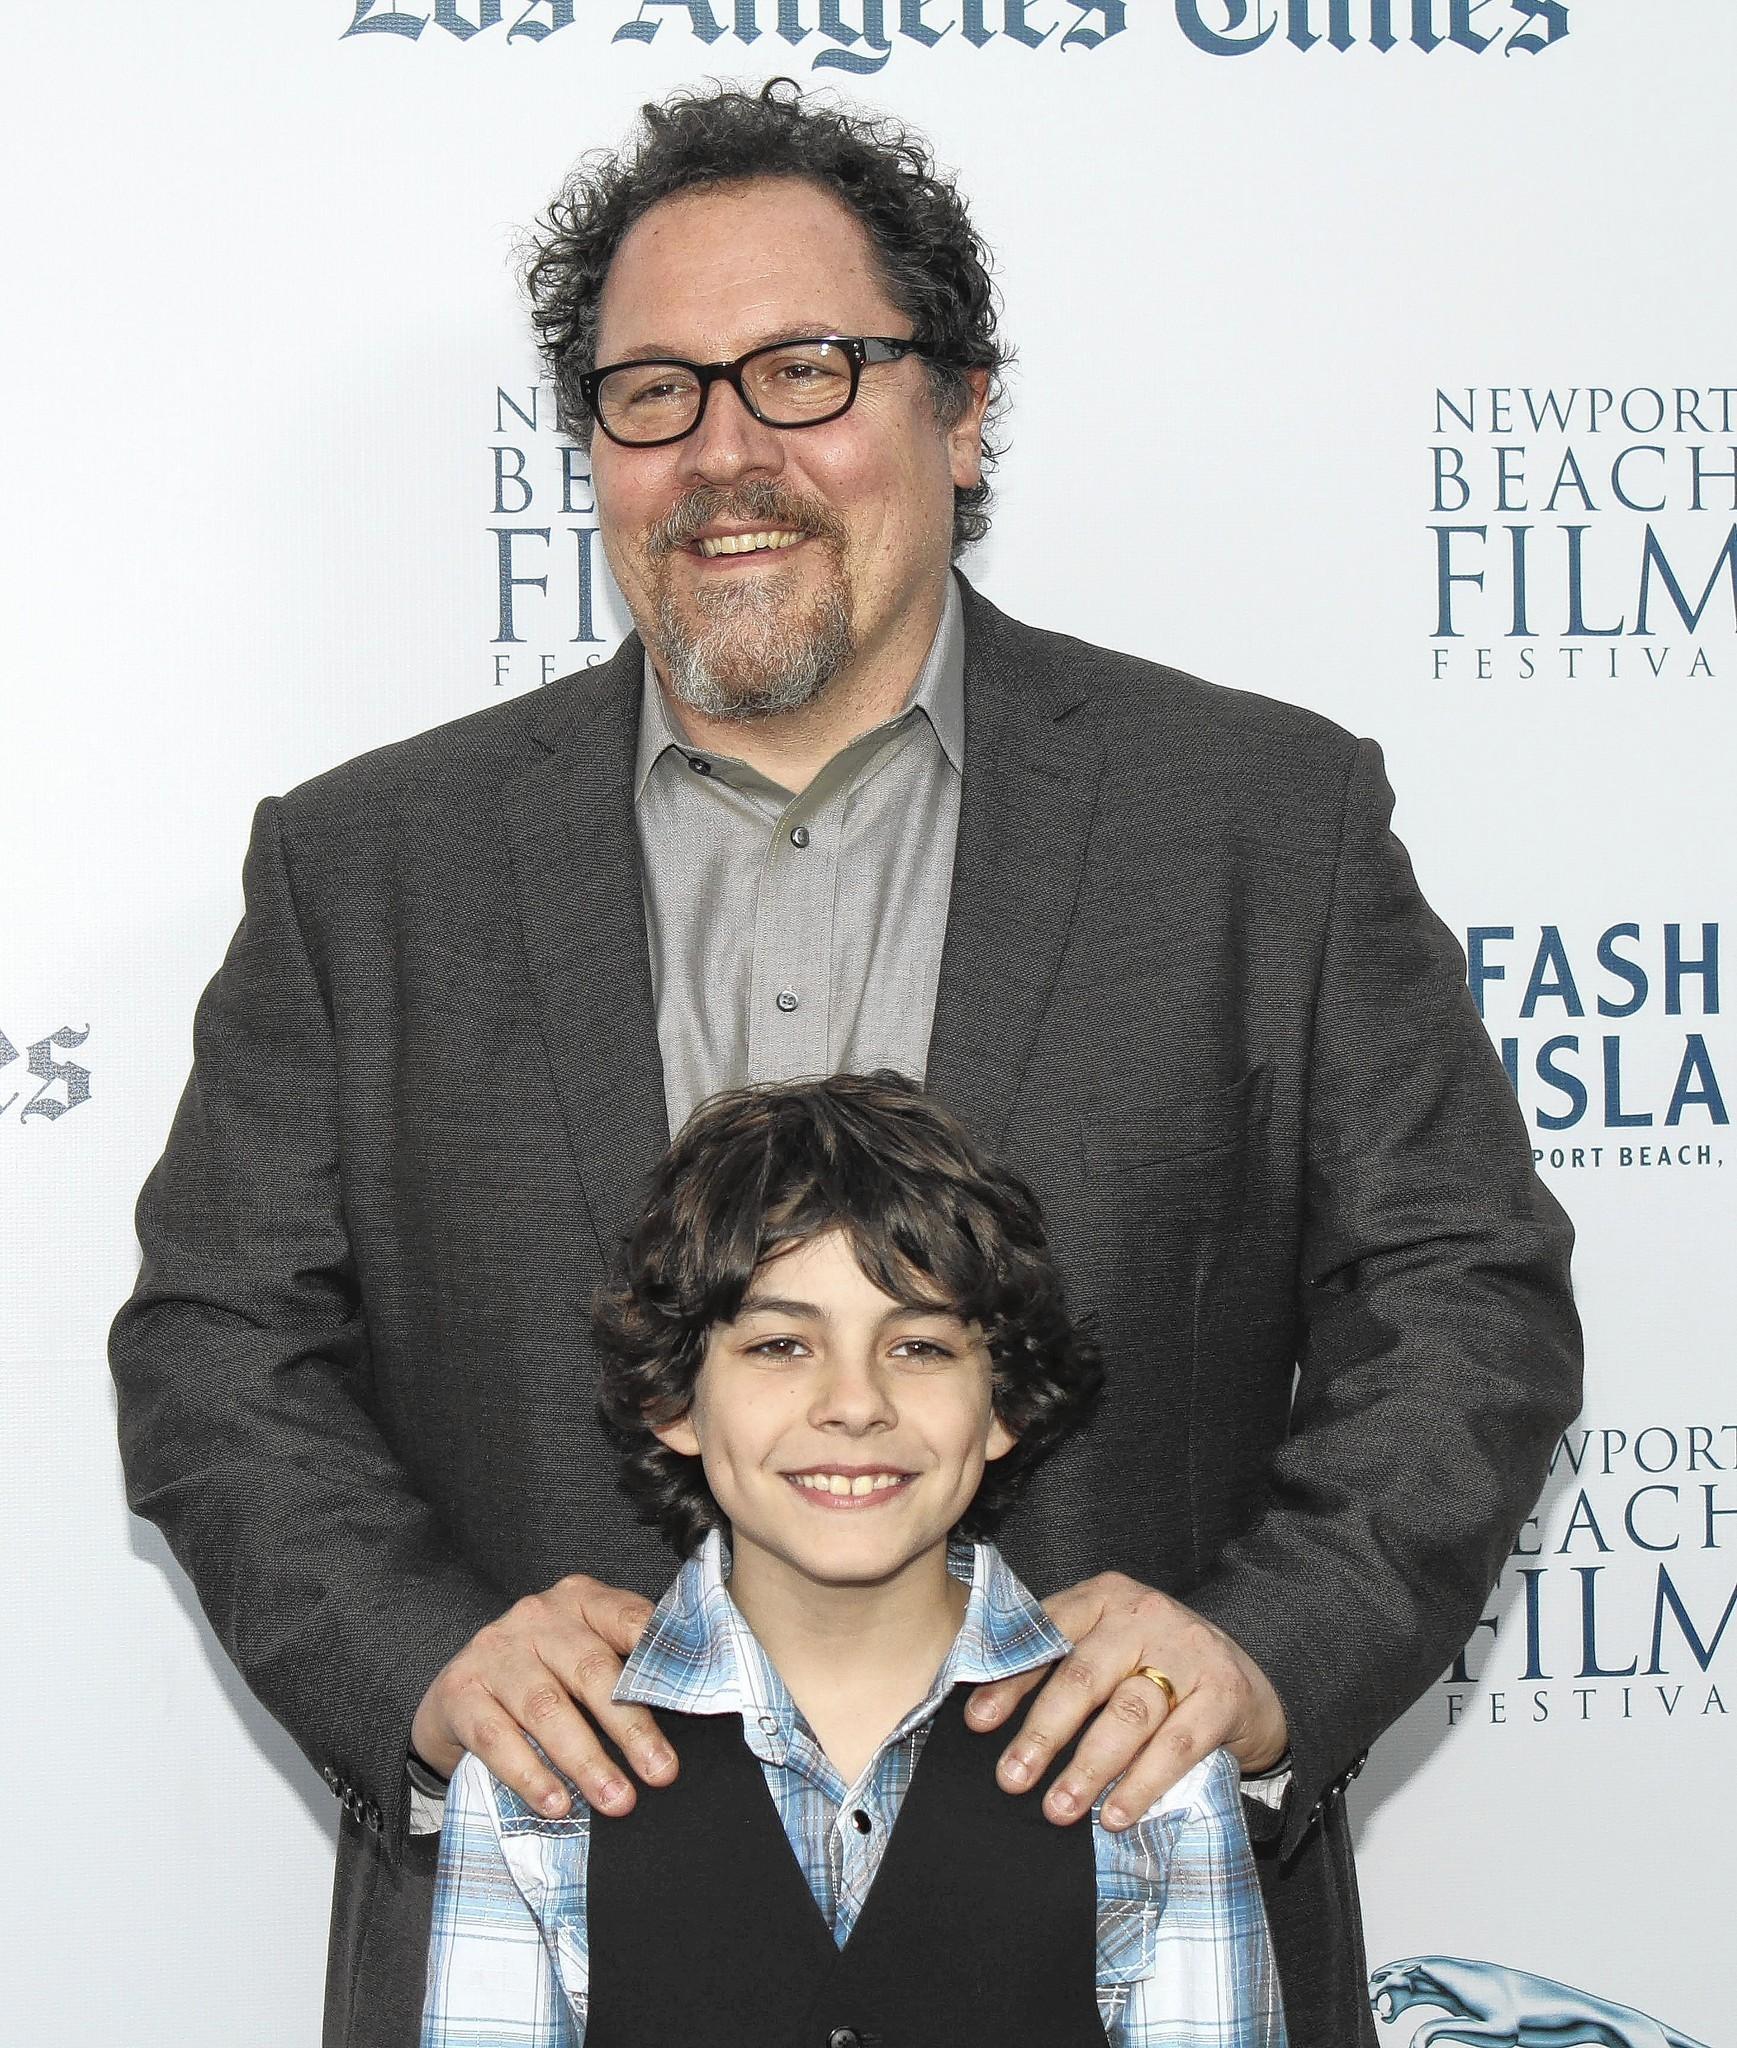 Film festival concludes with Jon Favreau's 'Chef'